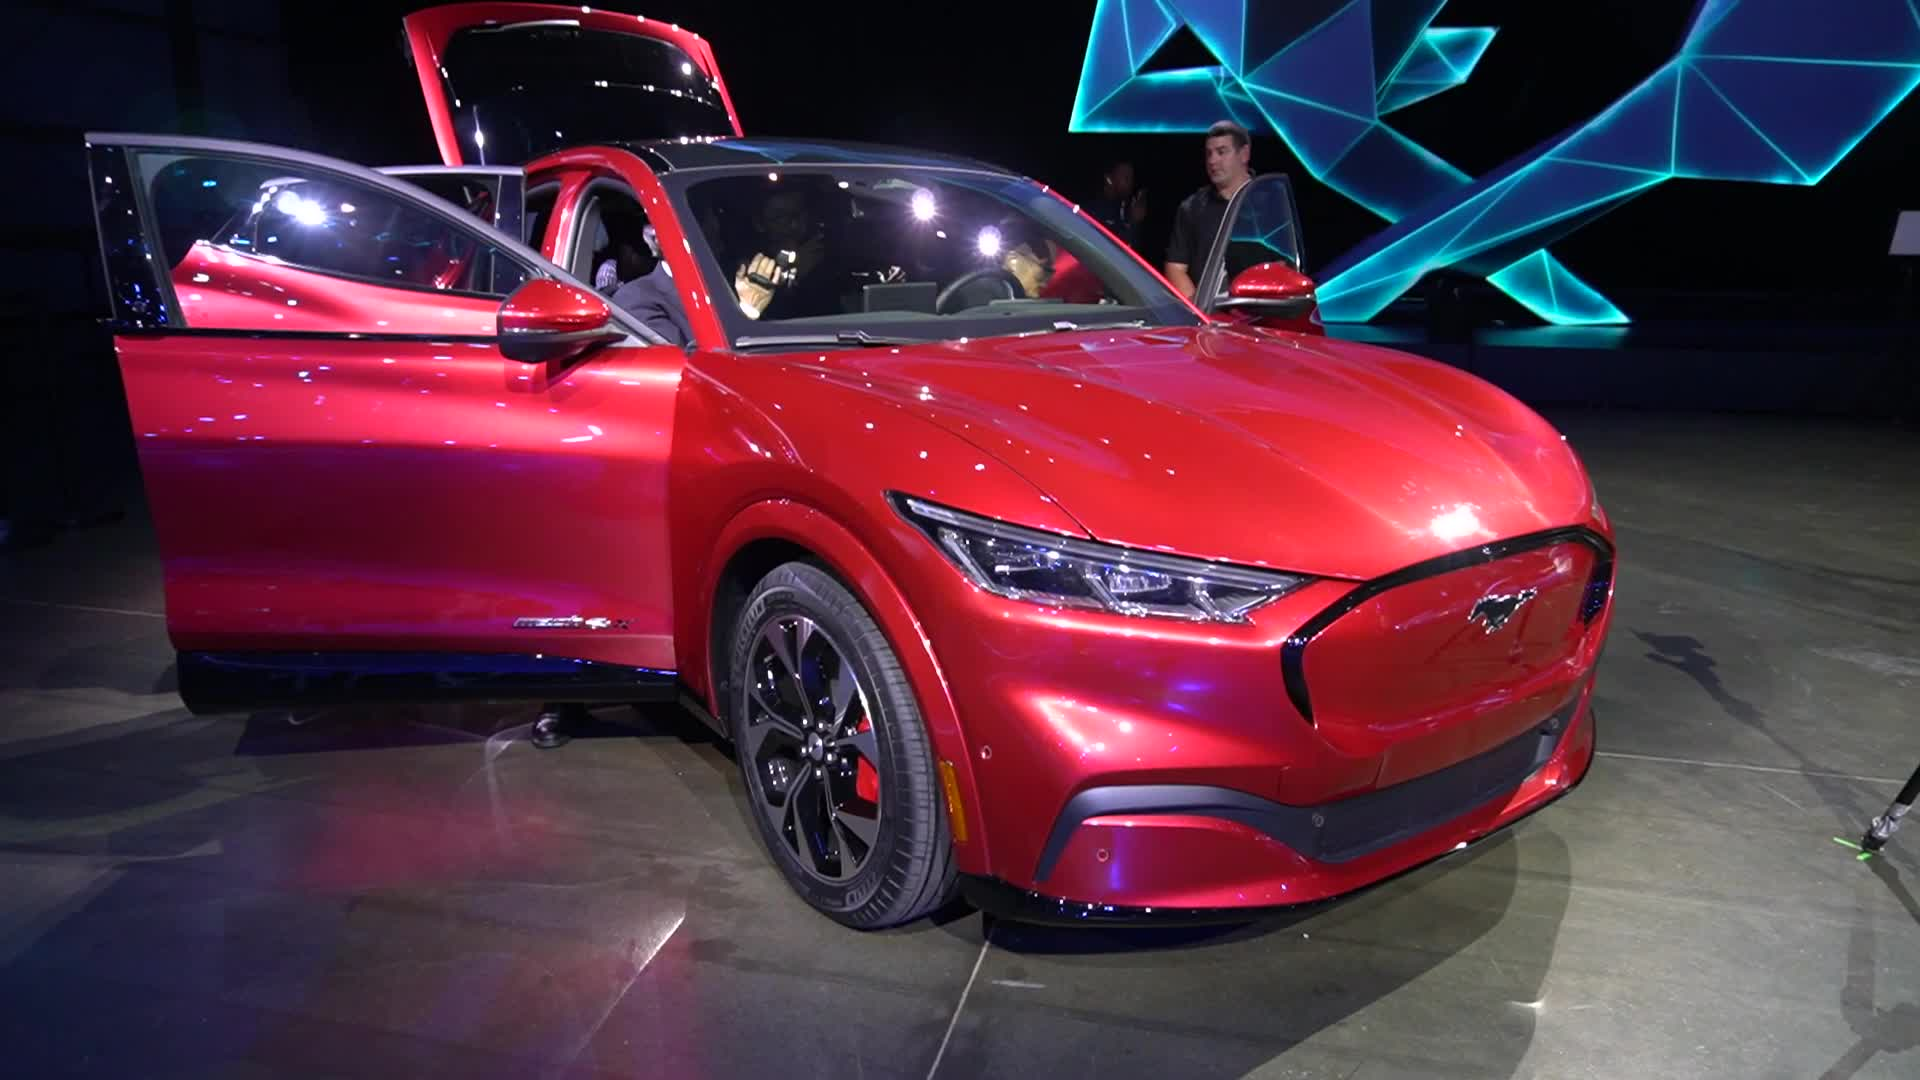 Auto, Elektroautos, Autos, Elektromobilität, Elektroauto, NewGadgets, Johannes Knapp, Ford, Fahrzeuge, Ford Mustang Mach-E, Ford Mustang